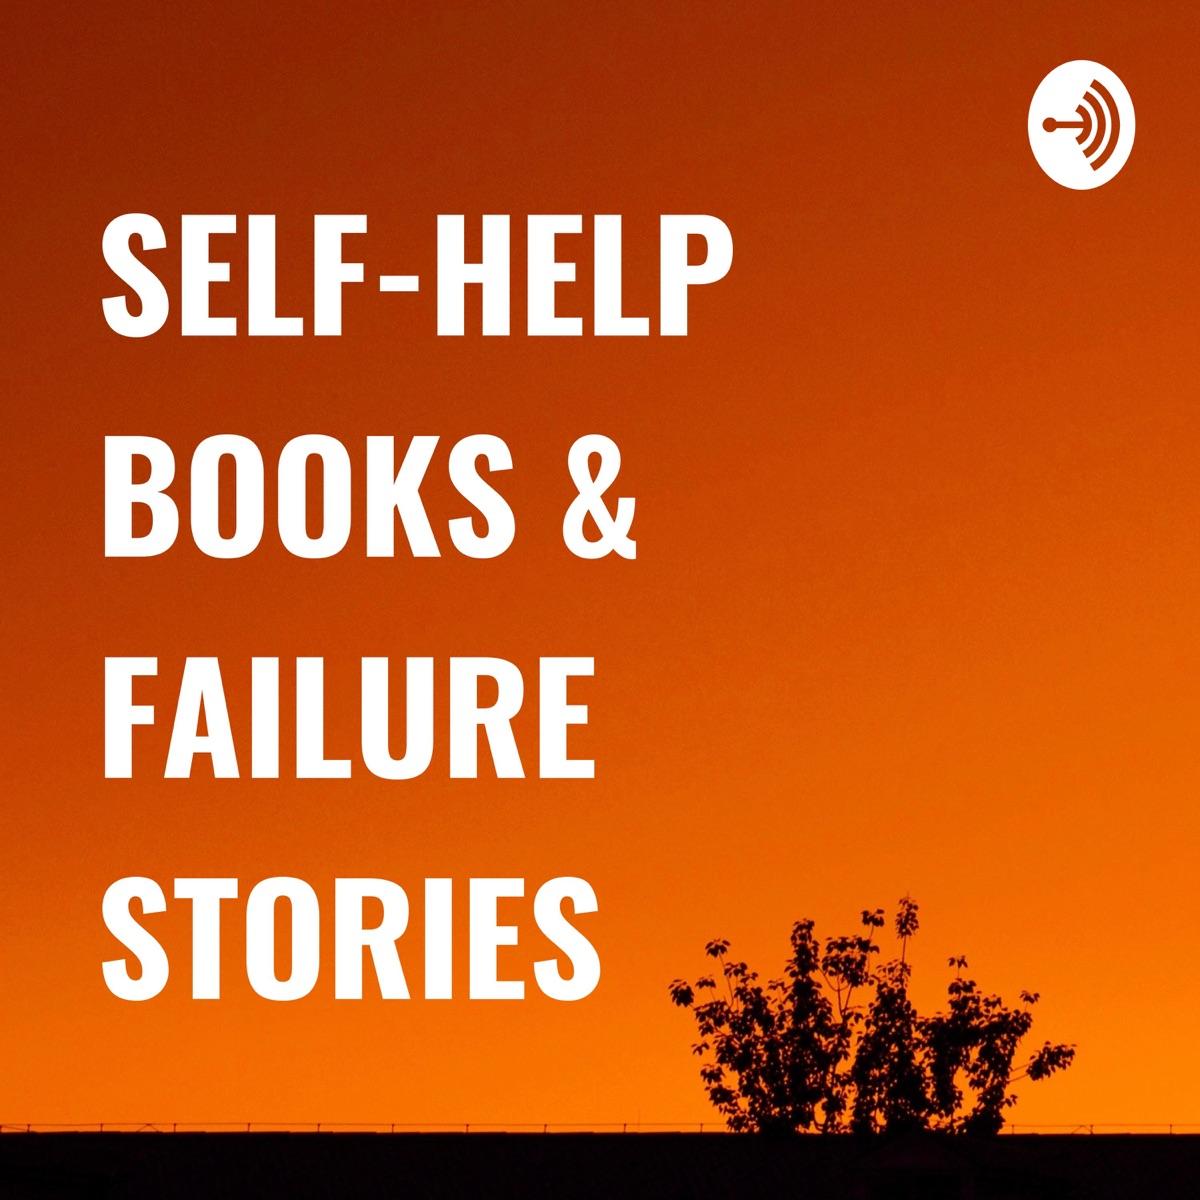 SELF-HELP BOOKS & FAILURE STORIES